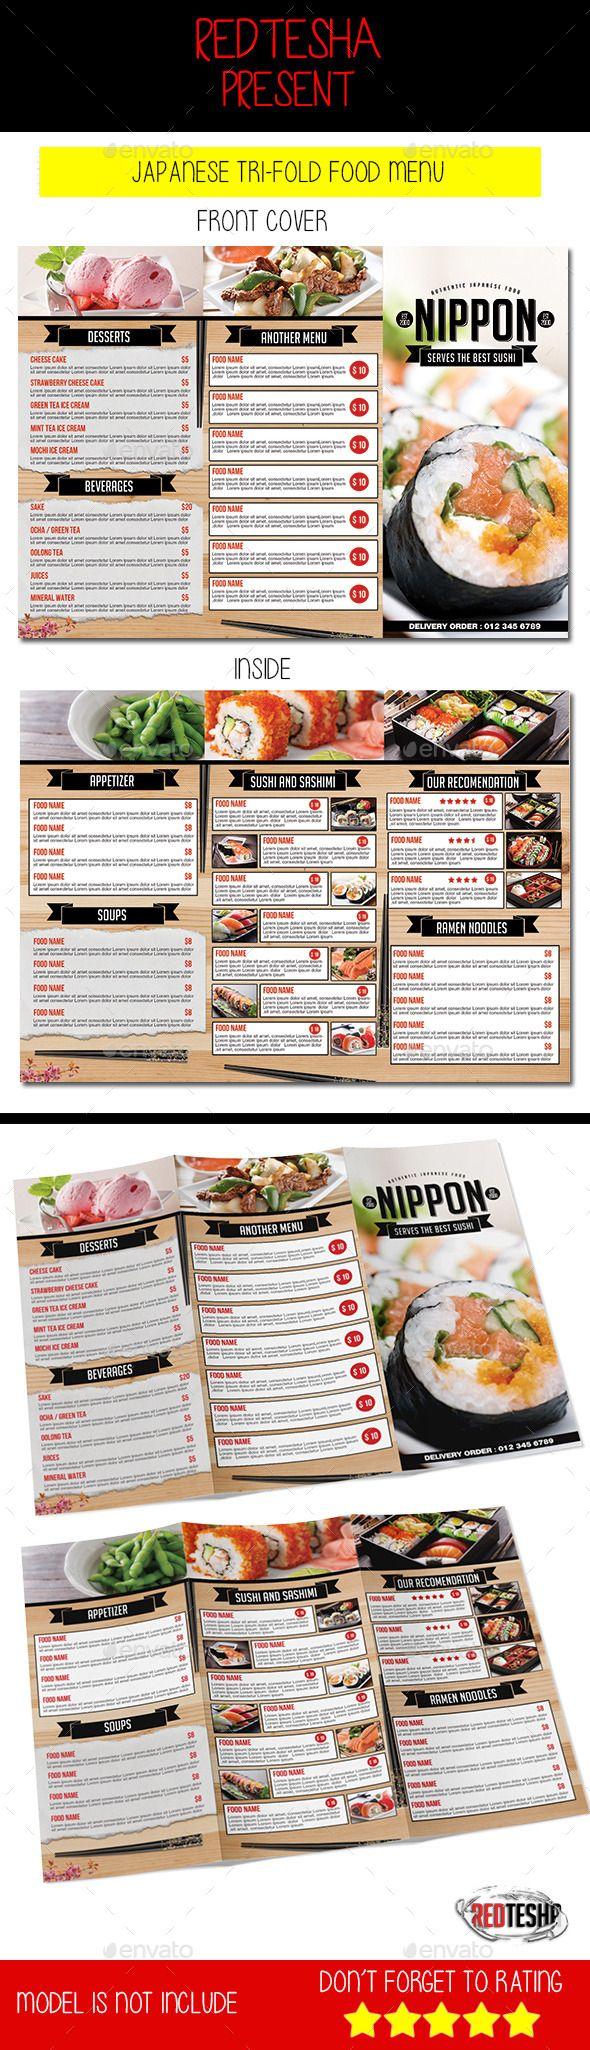 Japanese tri fold menu menu tri fold and menu templates japanese tri fold menu template design download httpgraphicriveritemjapanese trifold menu12664994refksioks maxwellsz